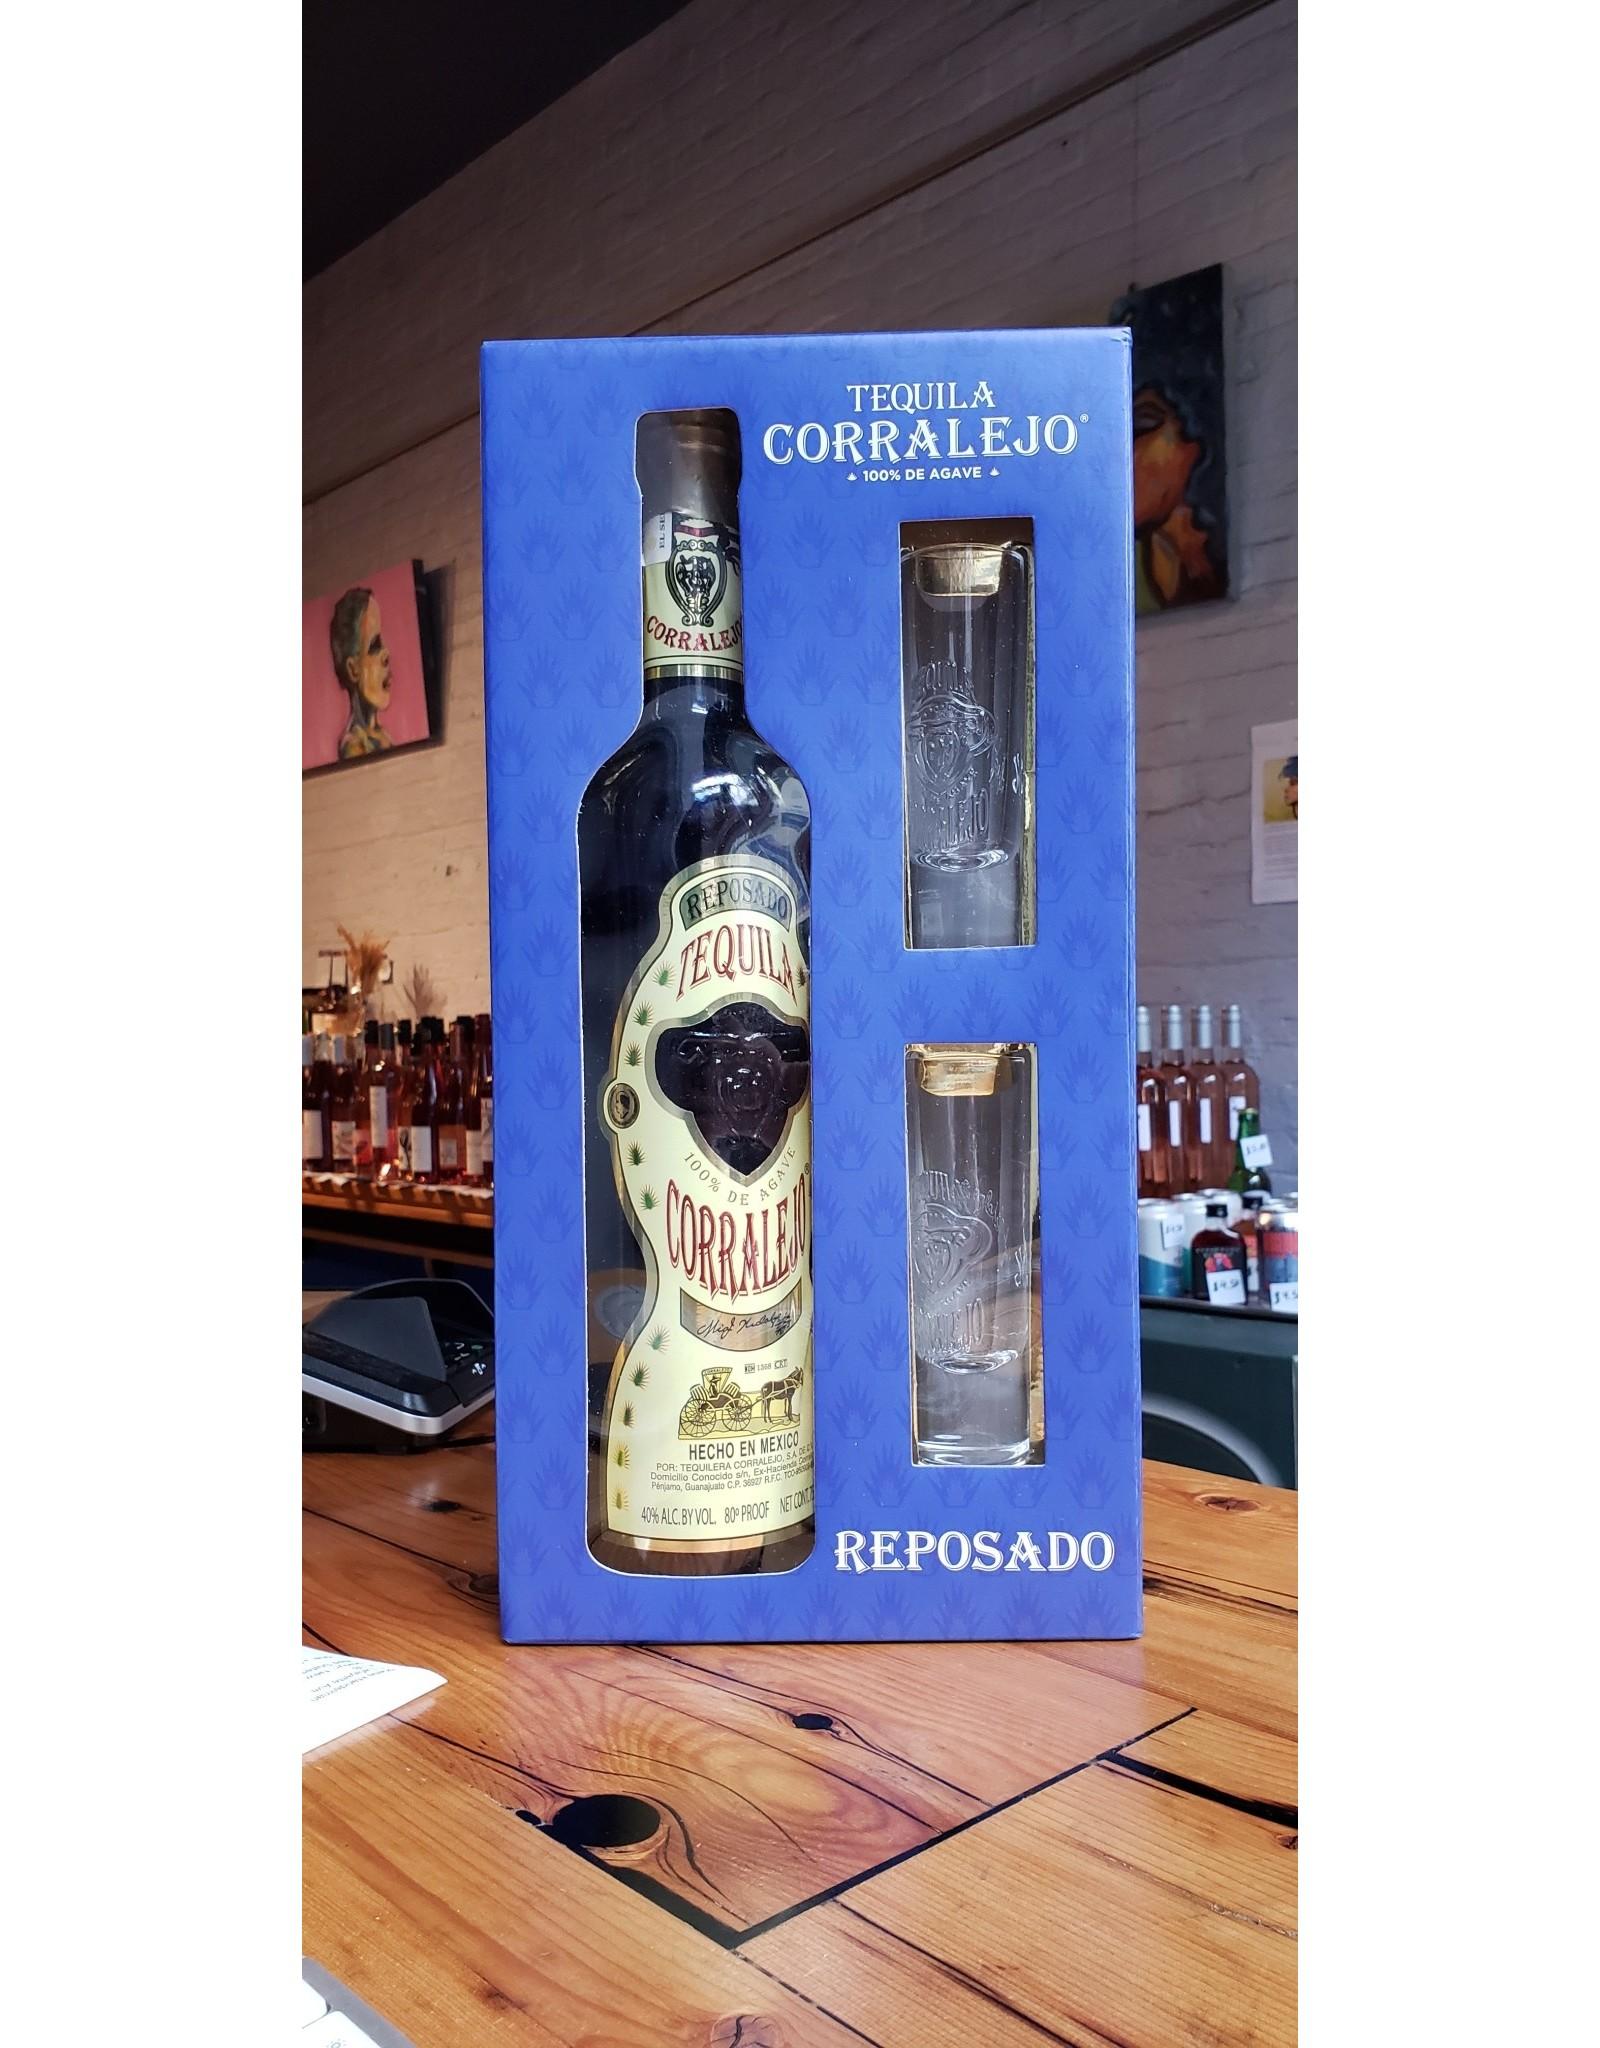 Corralejo Tequila Reposado - Penjamo, Guanajuato, Mexico (750ml)